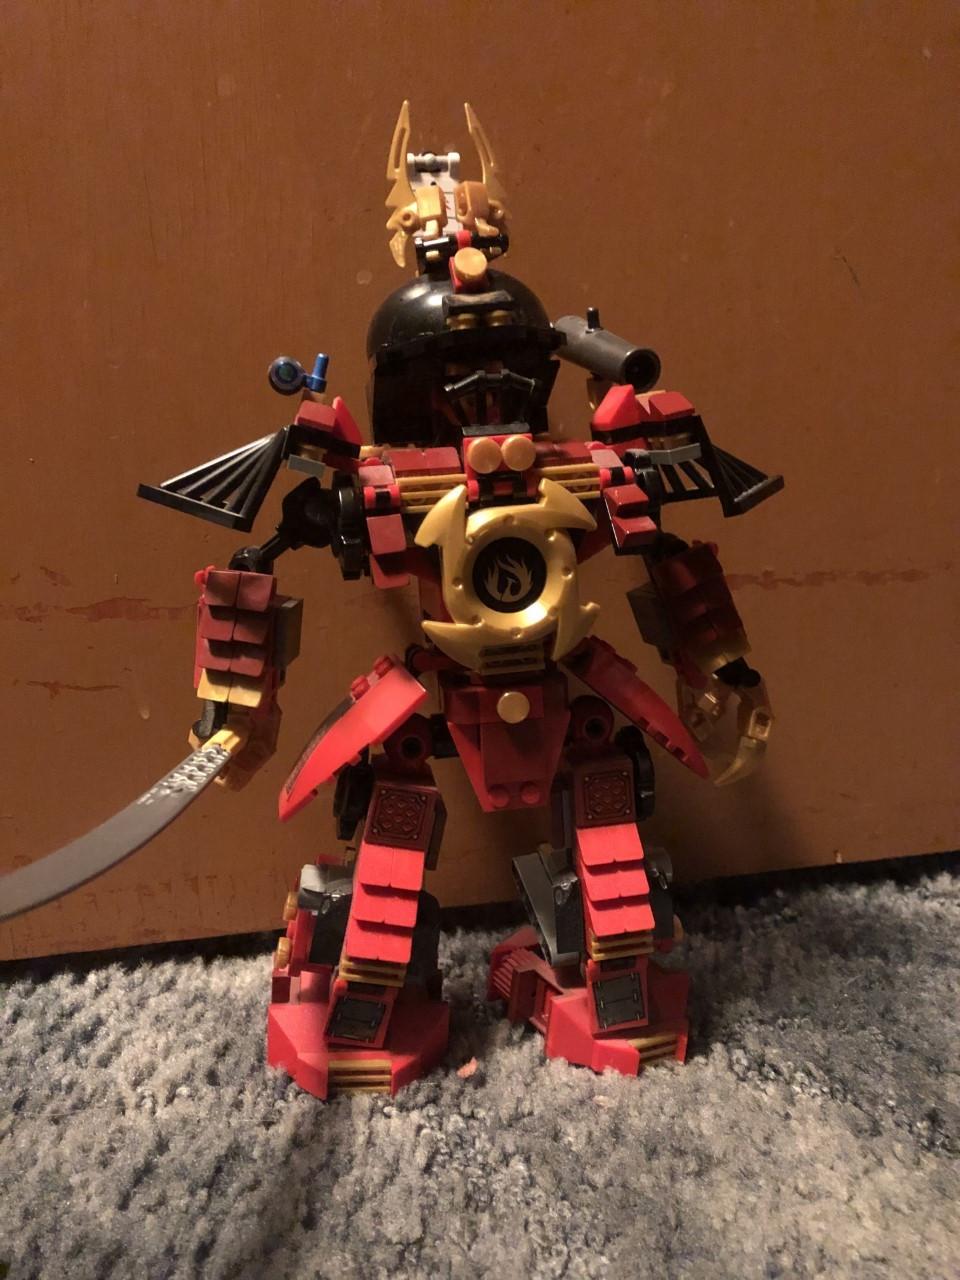 The authors lego man he built.